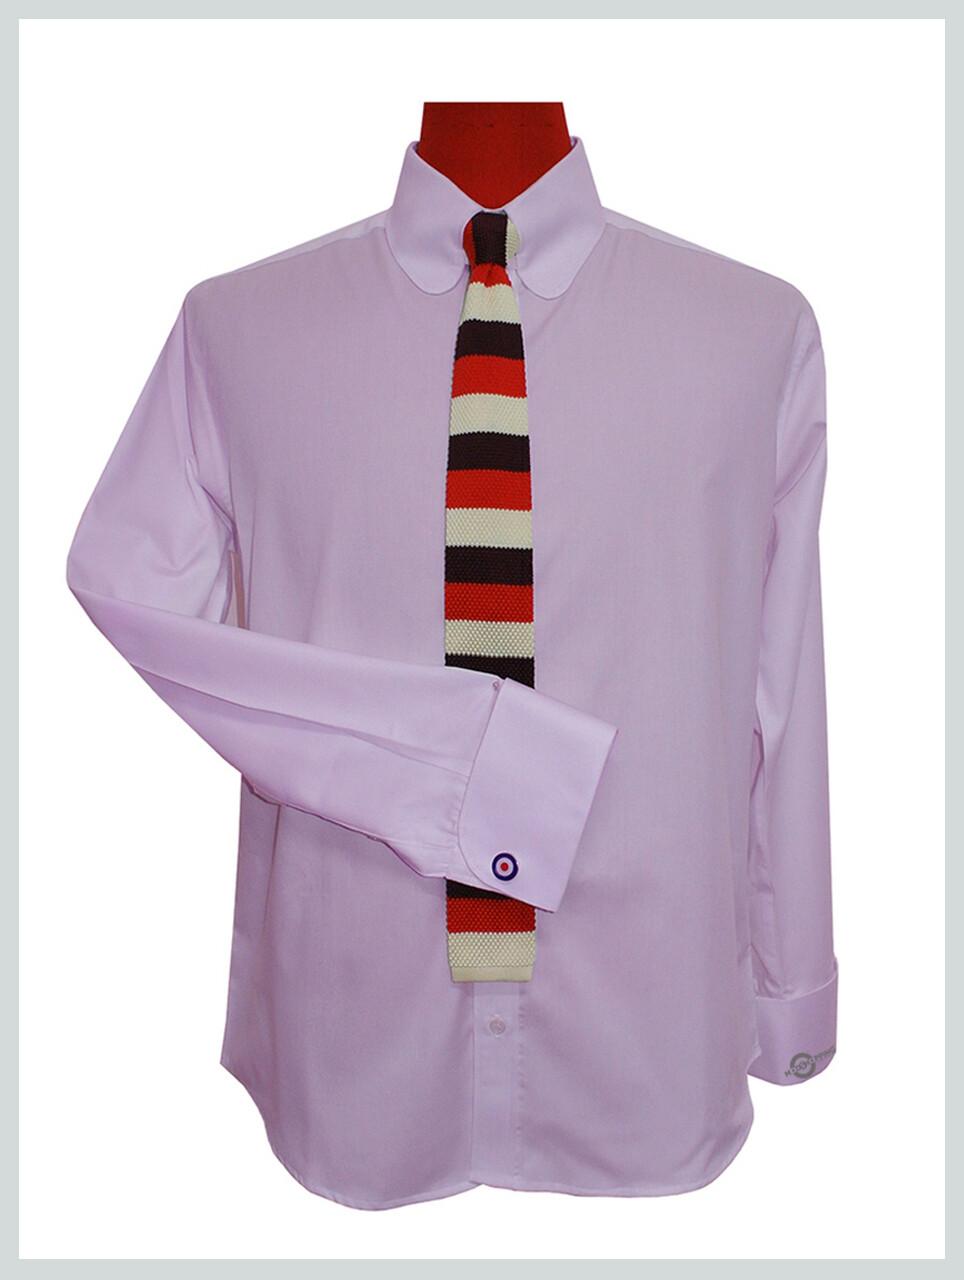 Lilac Shirt| Penny Pin Collar Long Sleeve Vintage Lilac Shirt For Men